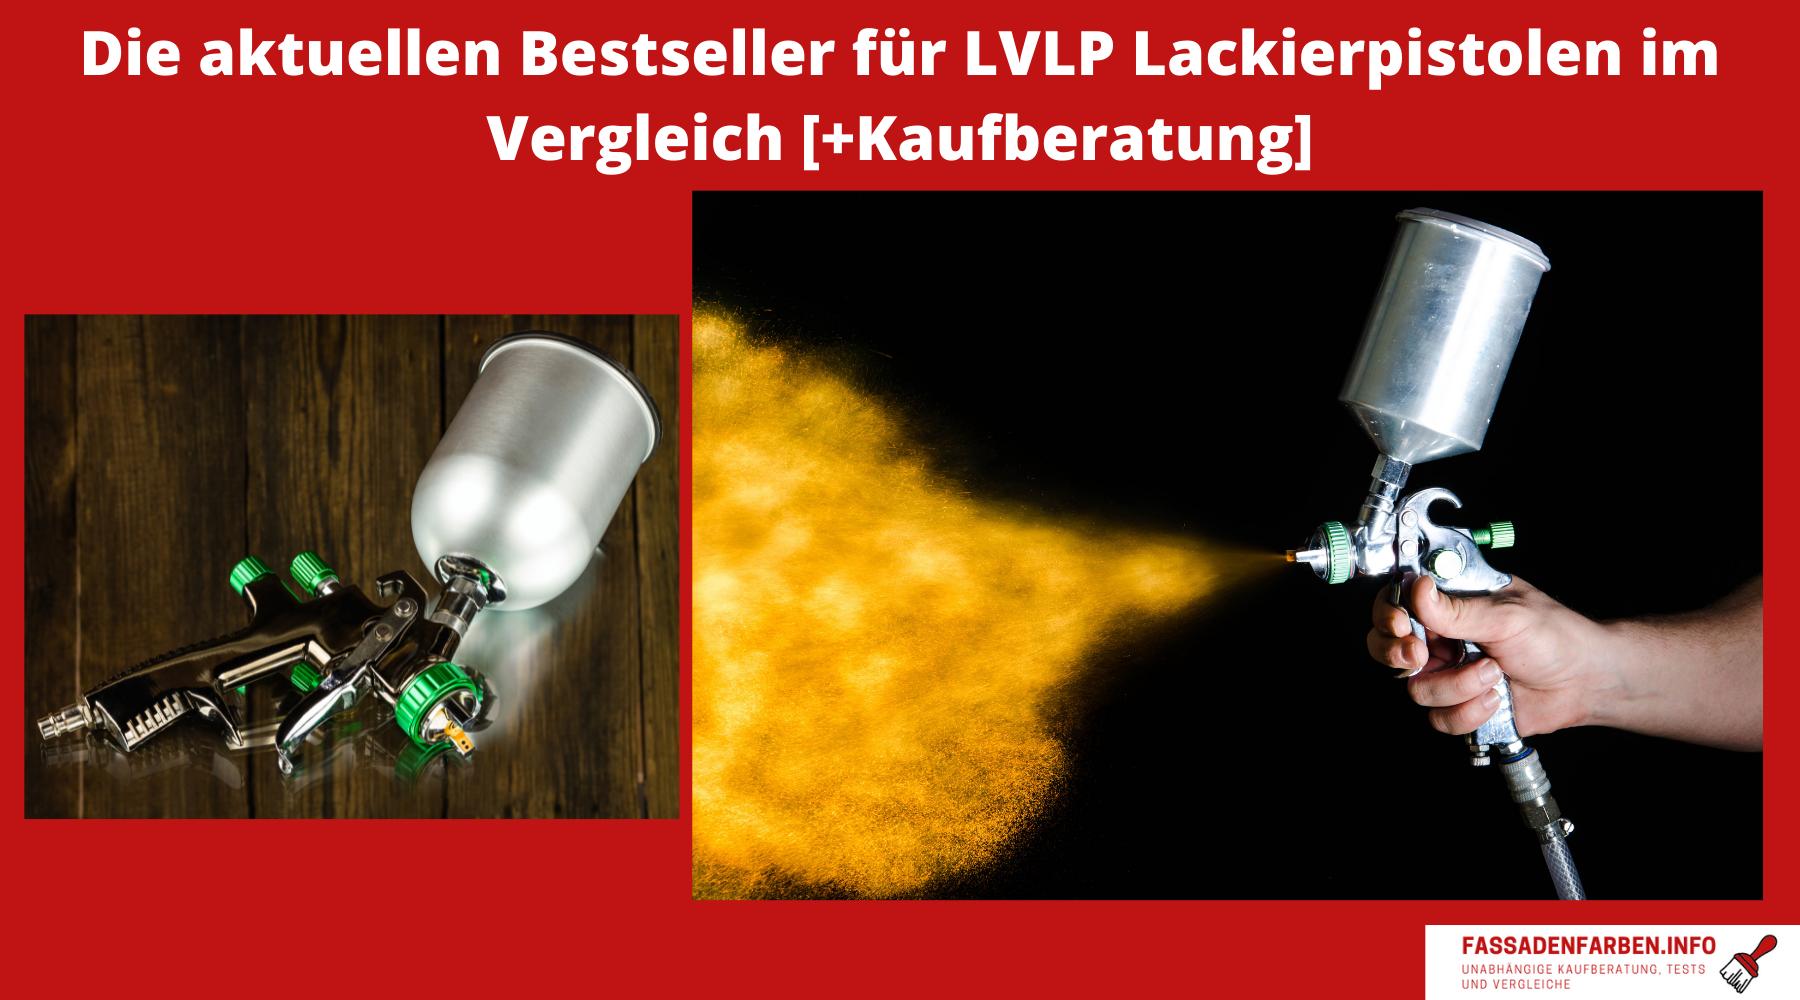 LVLP Lackierpistole Test